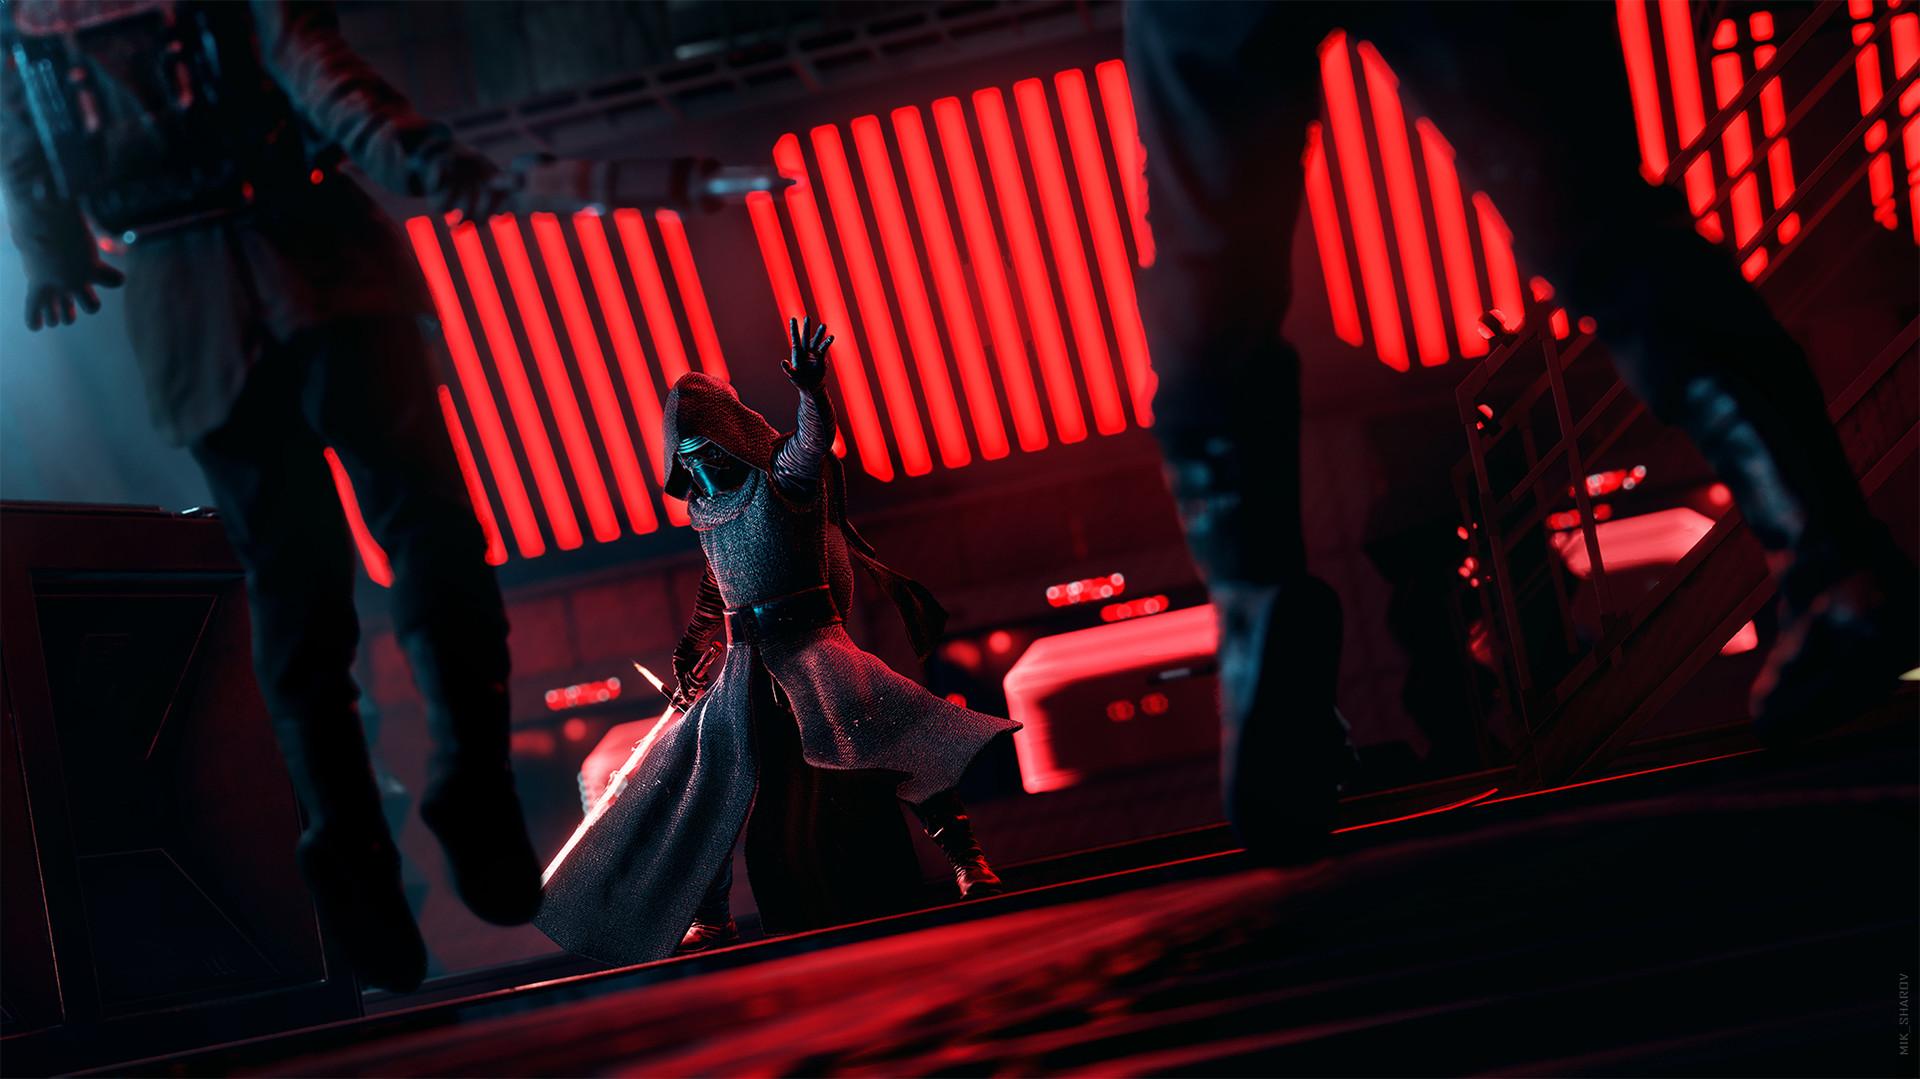 Kylo Ren Star Wars Wallpaper